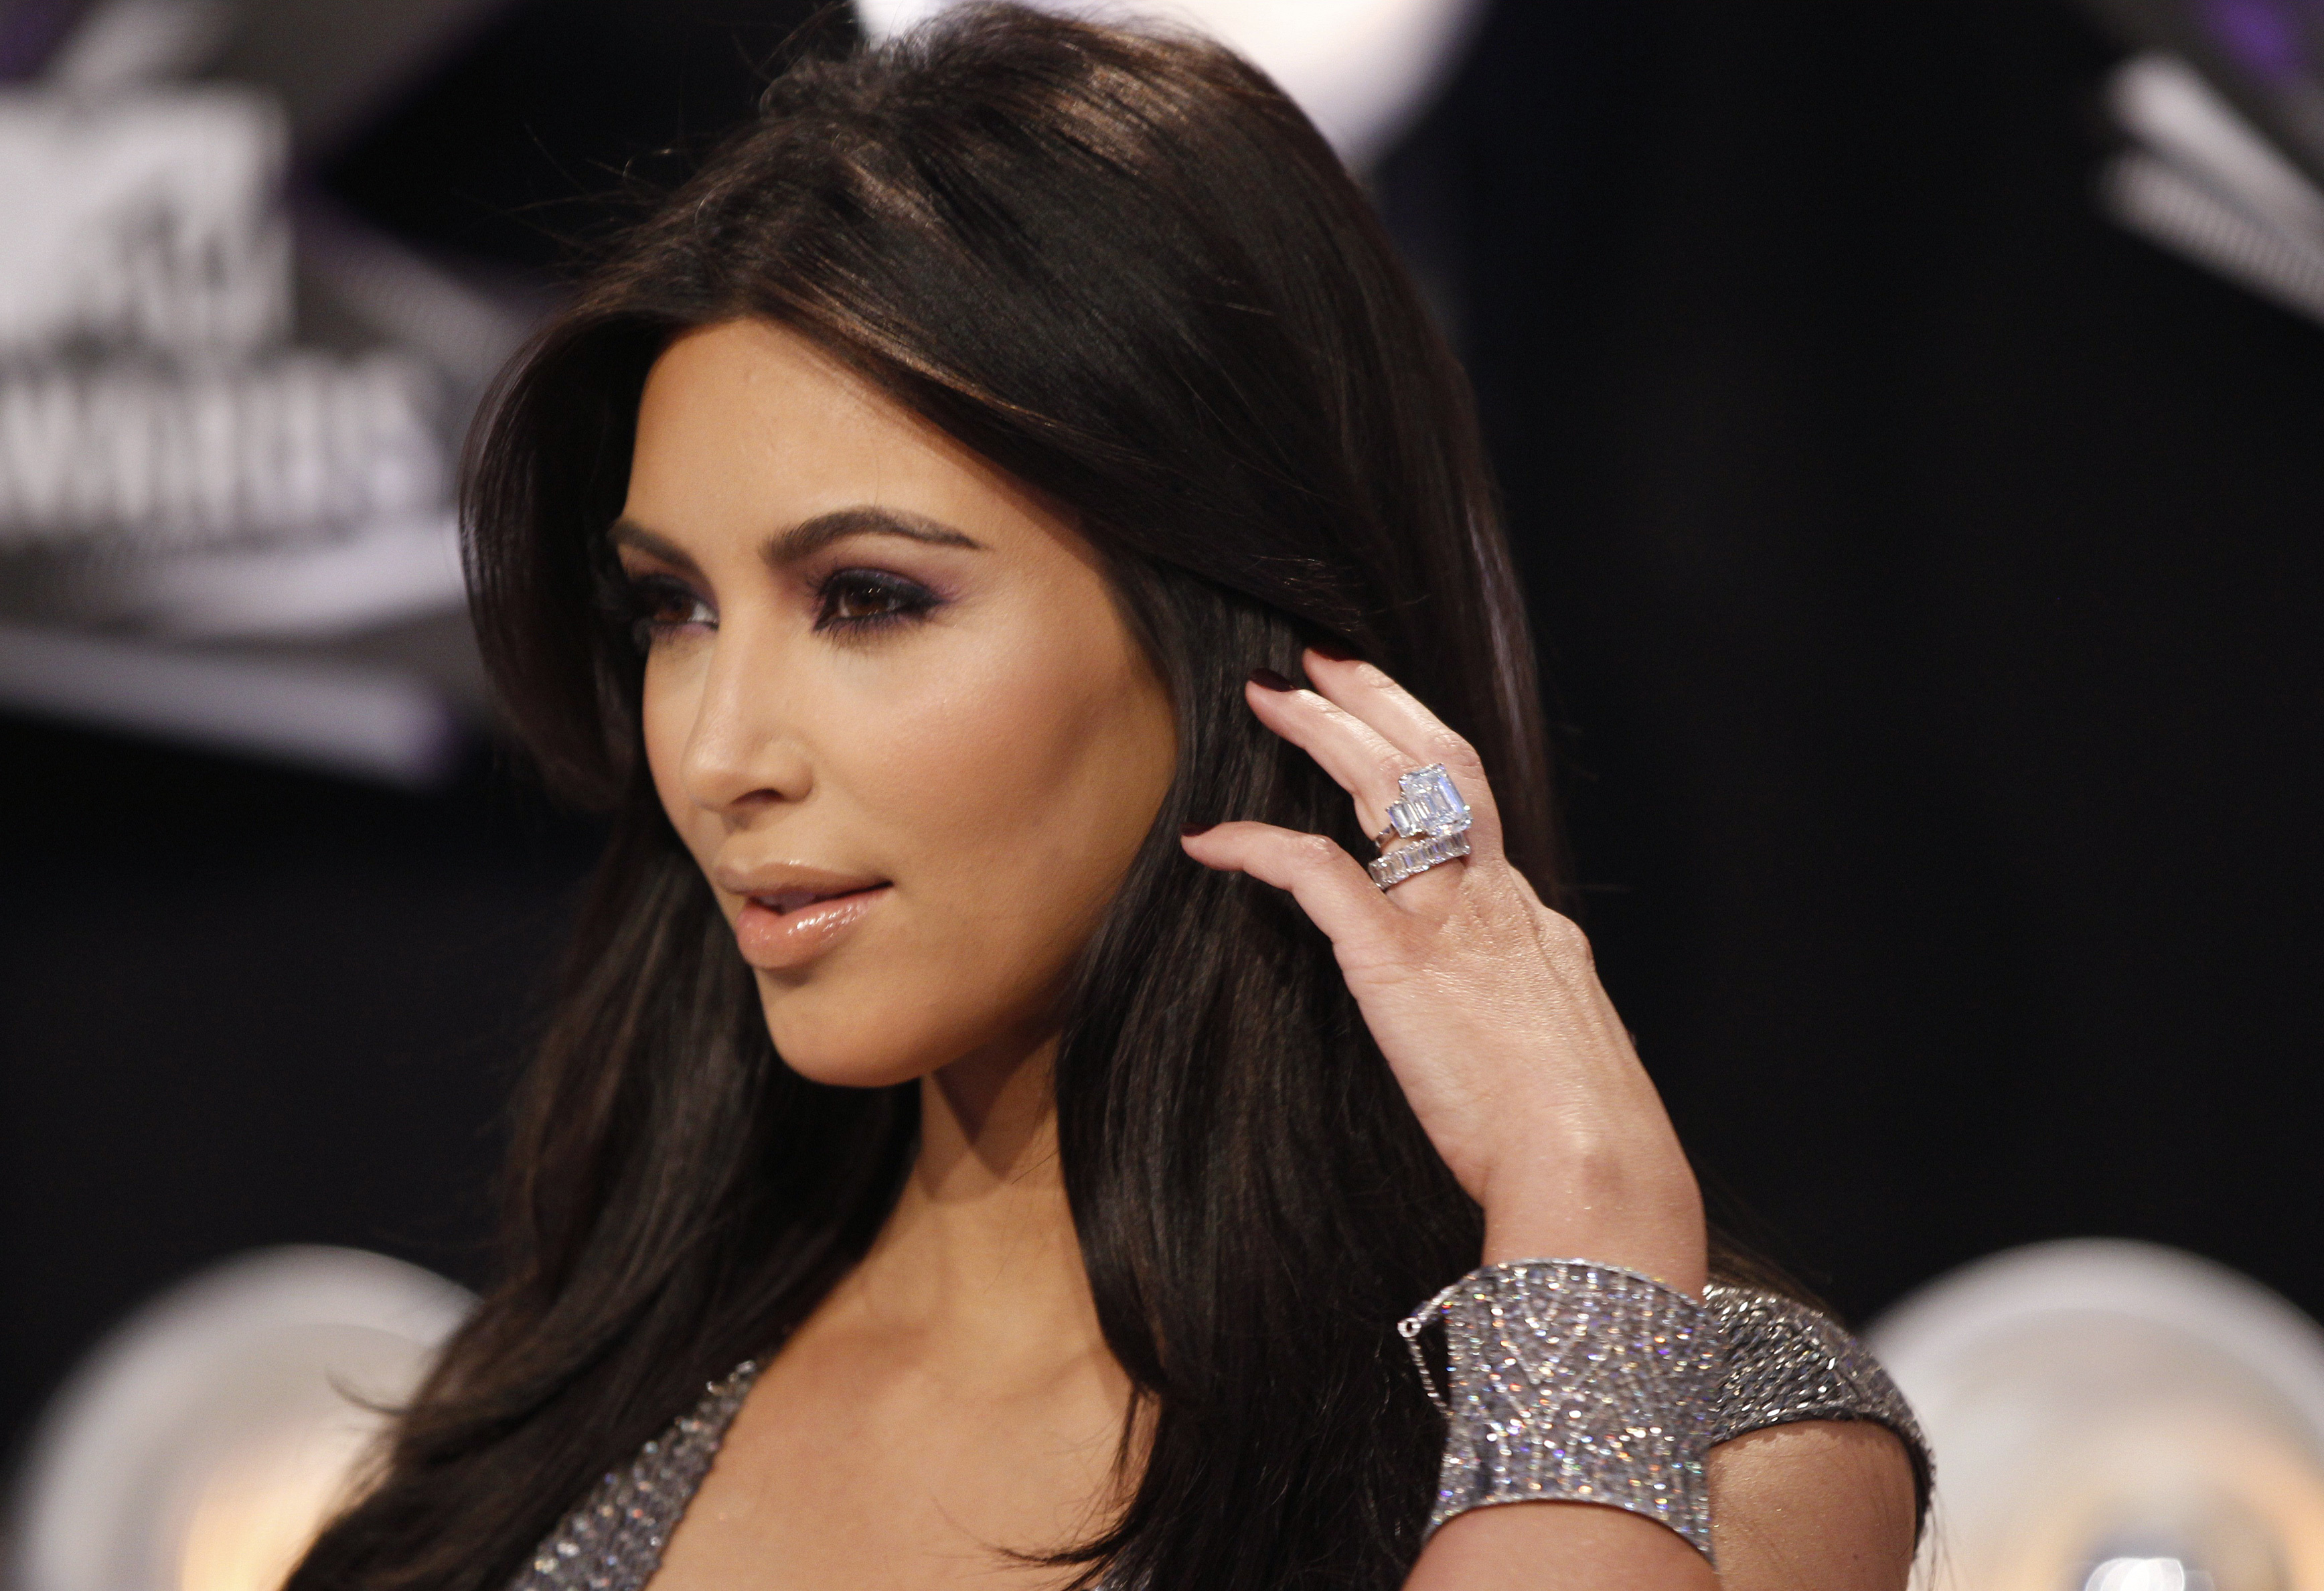 Kim Kardashian Wallpapers And Backgrounds